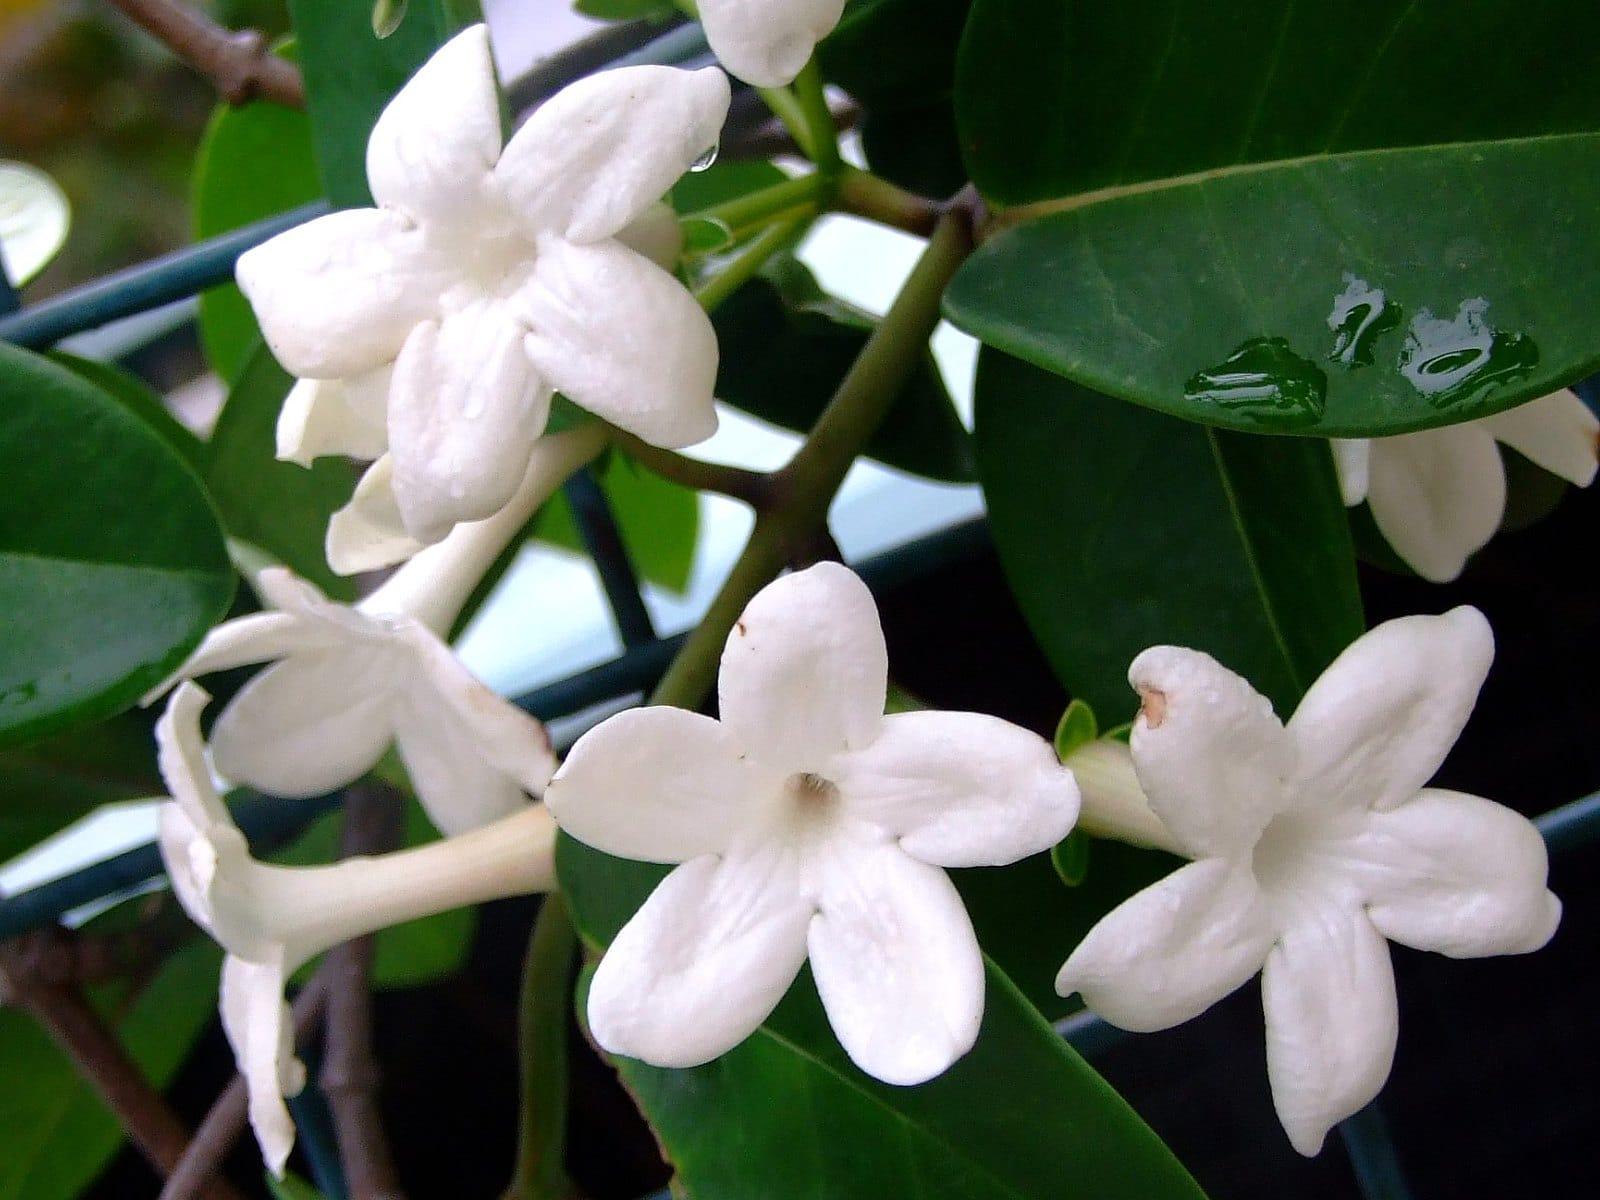 Vista del estefanotis en flor